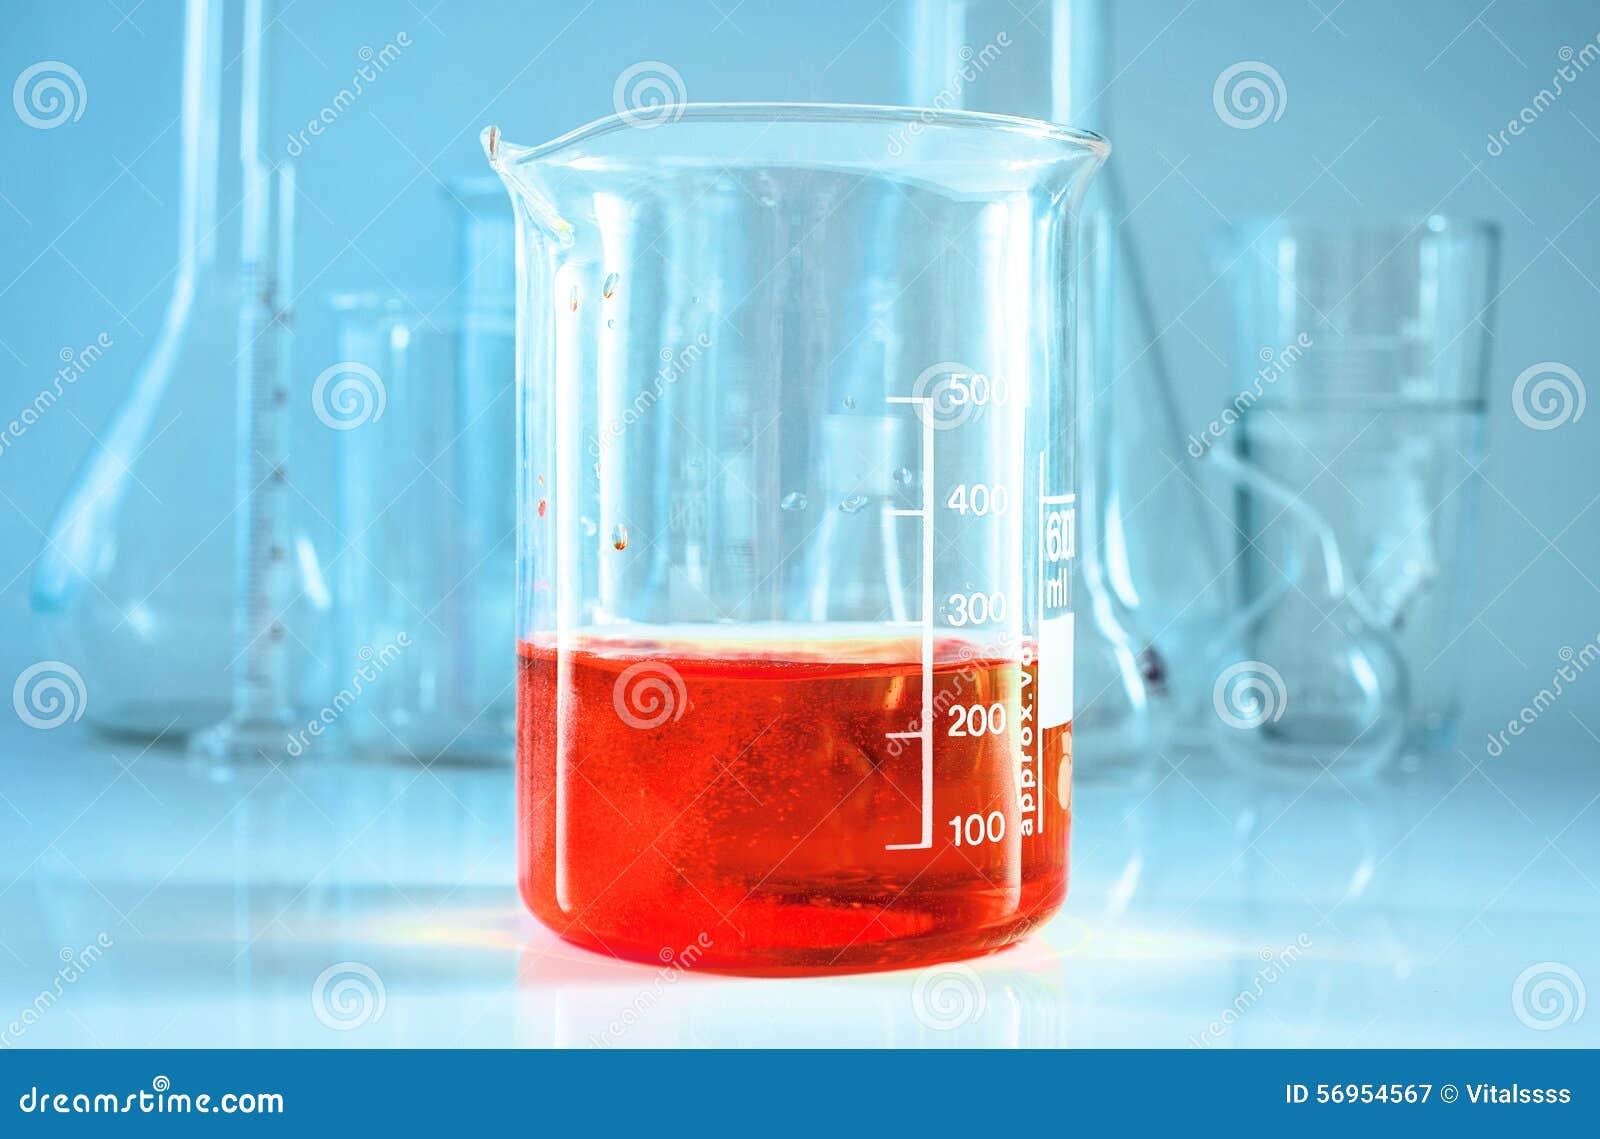 Chemical glassware. Chem laboratory.